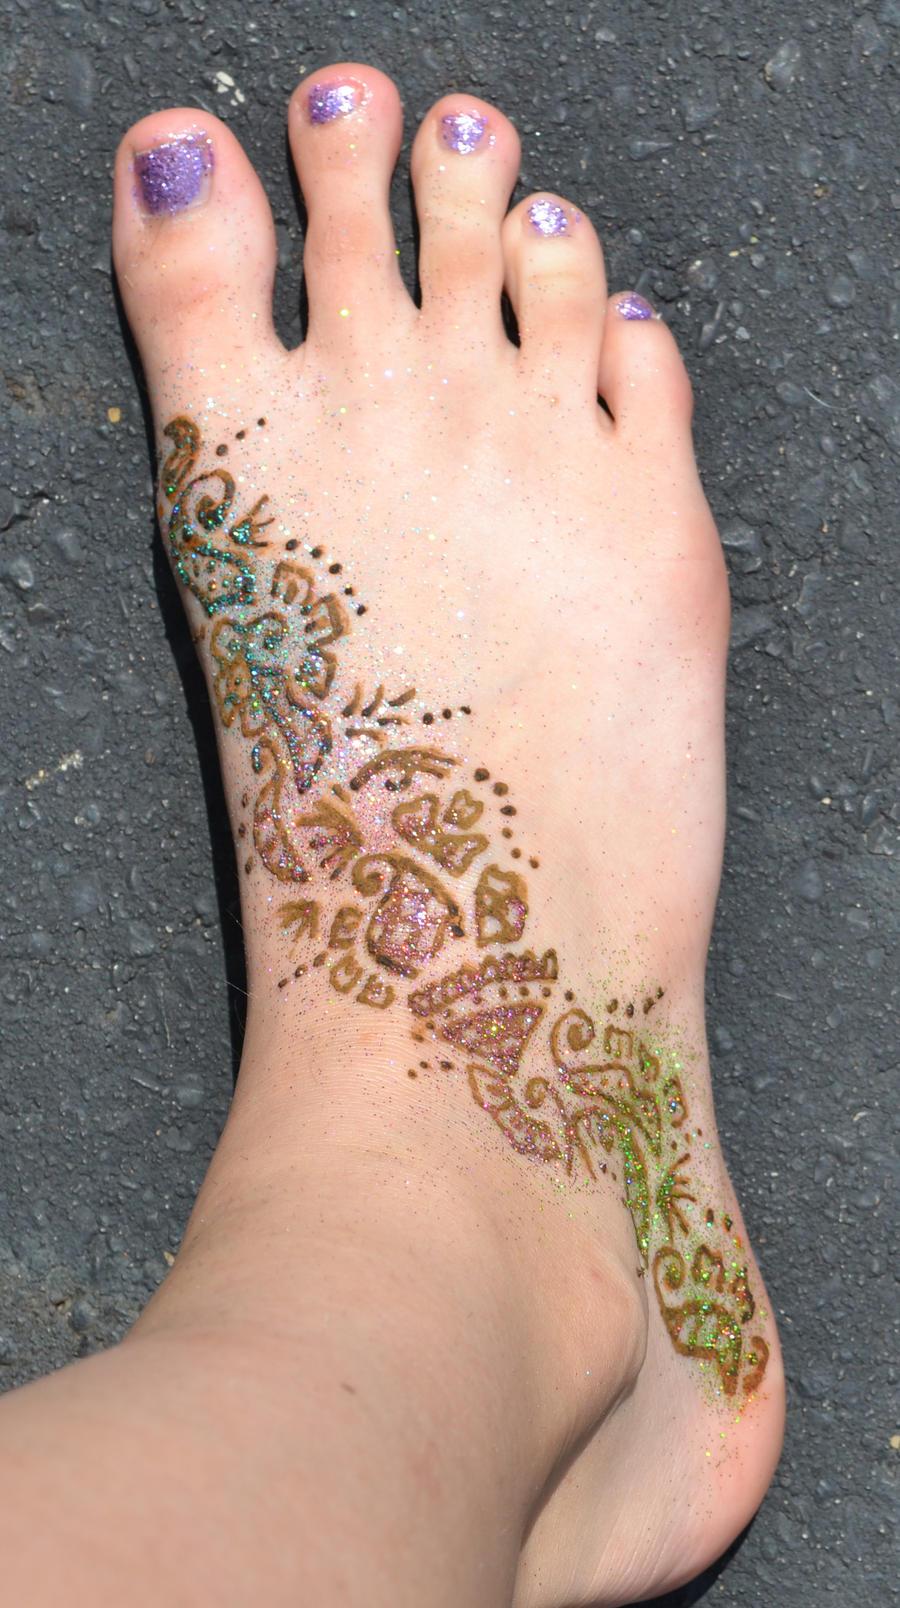 Foot henna tattoo by yobanda on deviantart for Henna tattoo shop